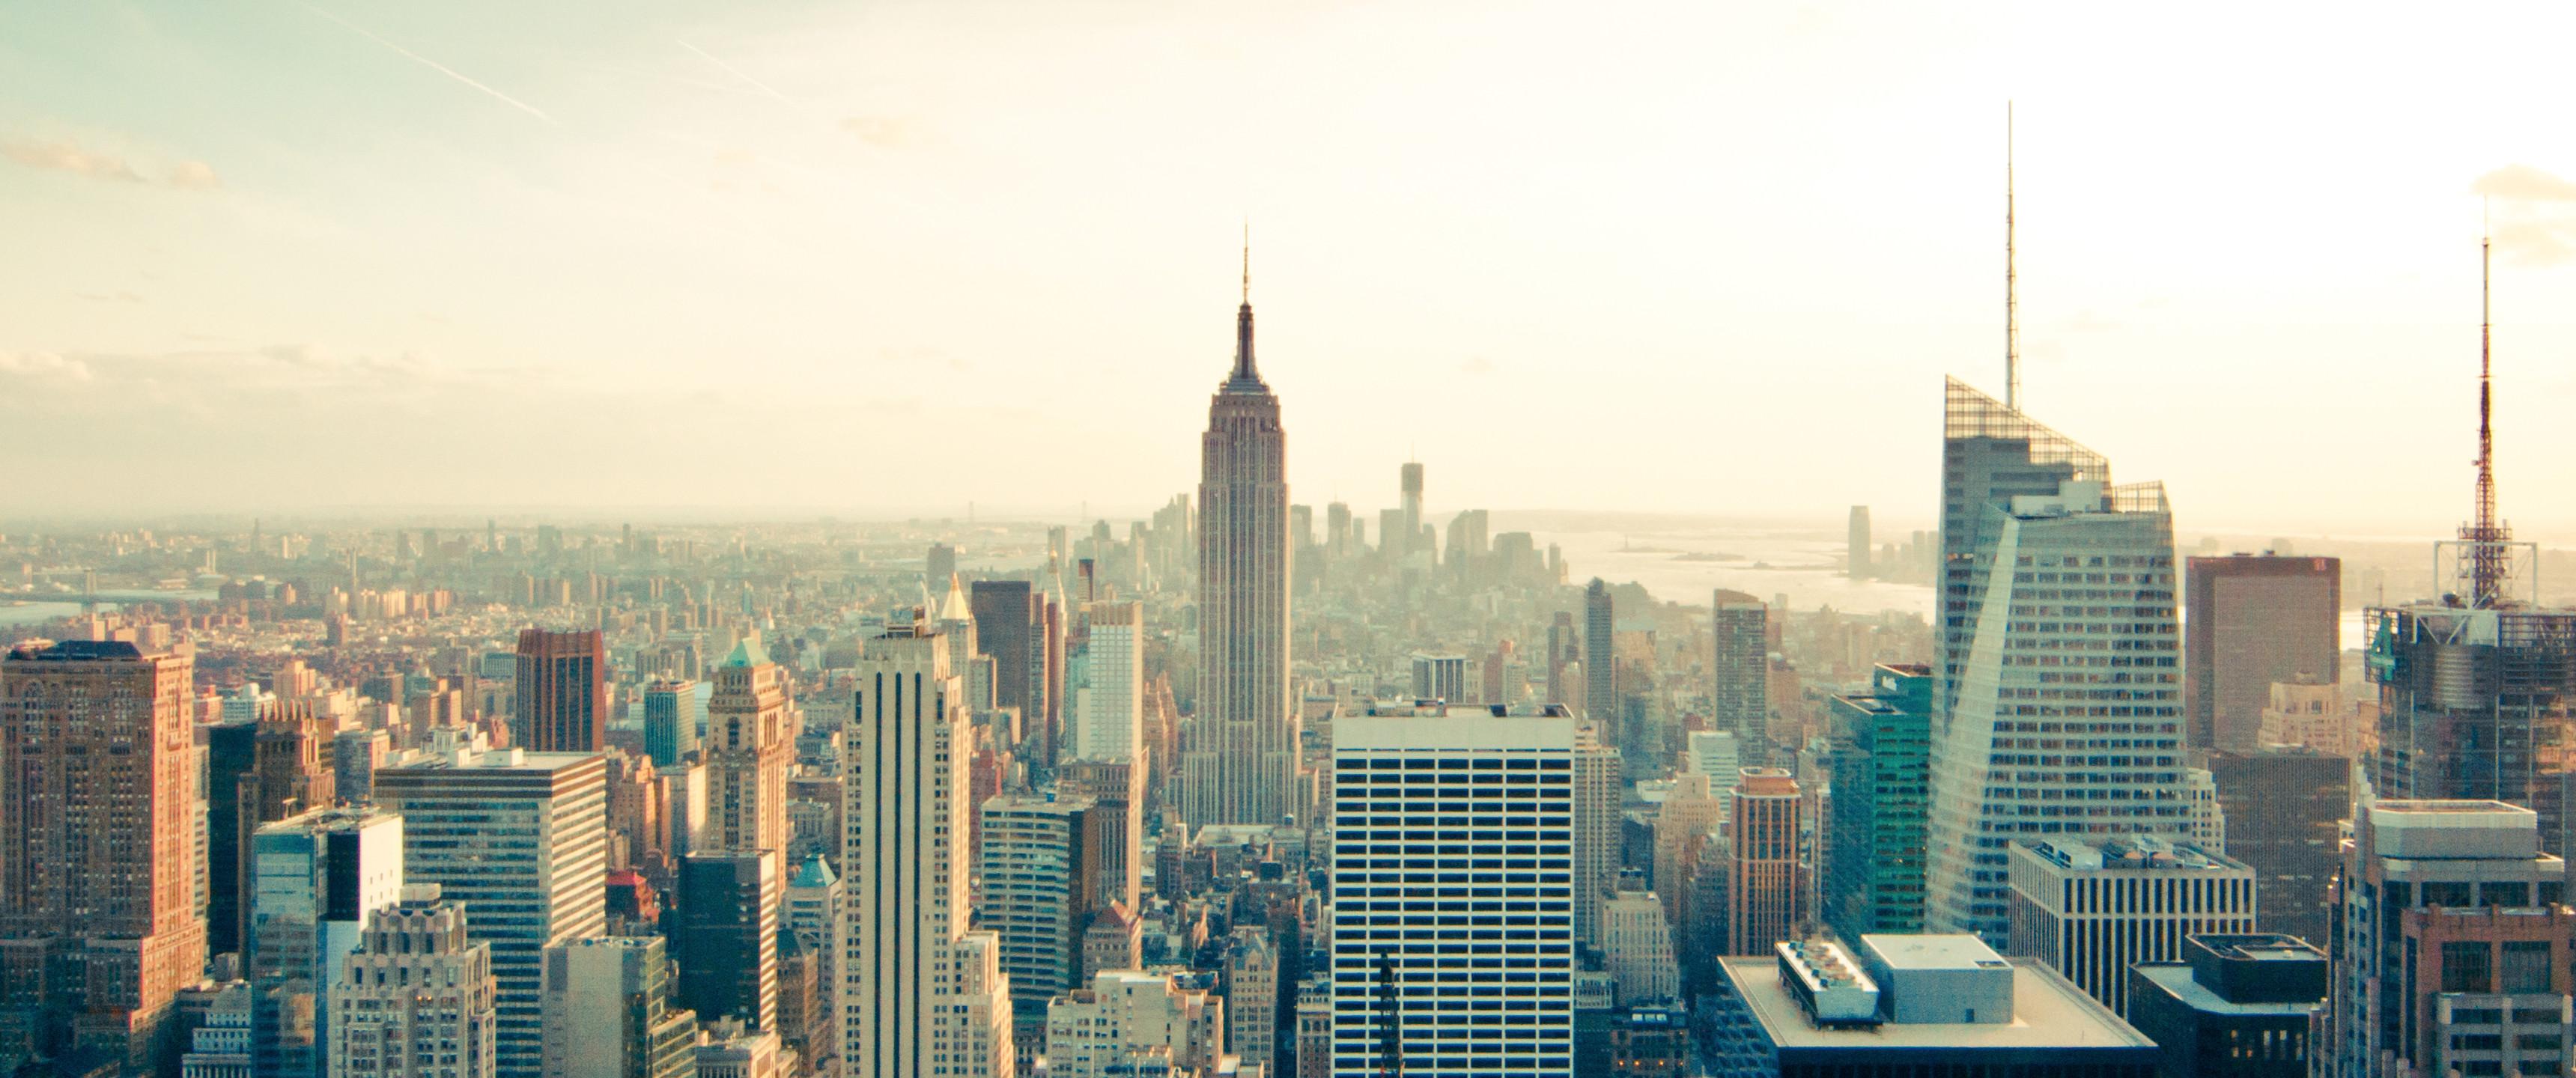 21:9 Ultrawide HD Wallpaper (3440×1440) – New York Skyline.. View